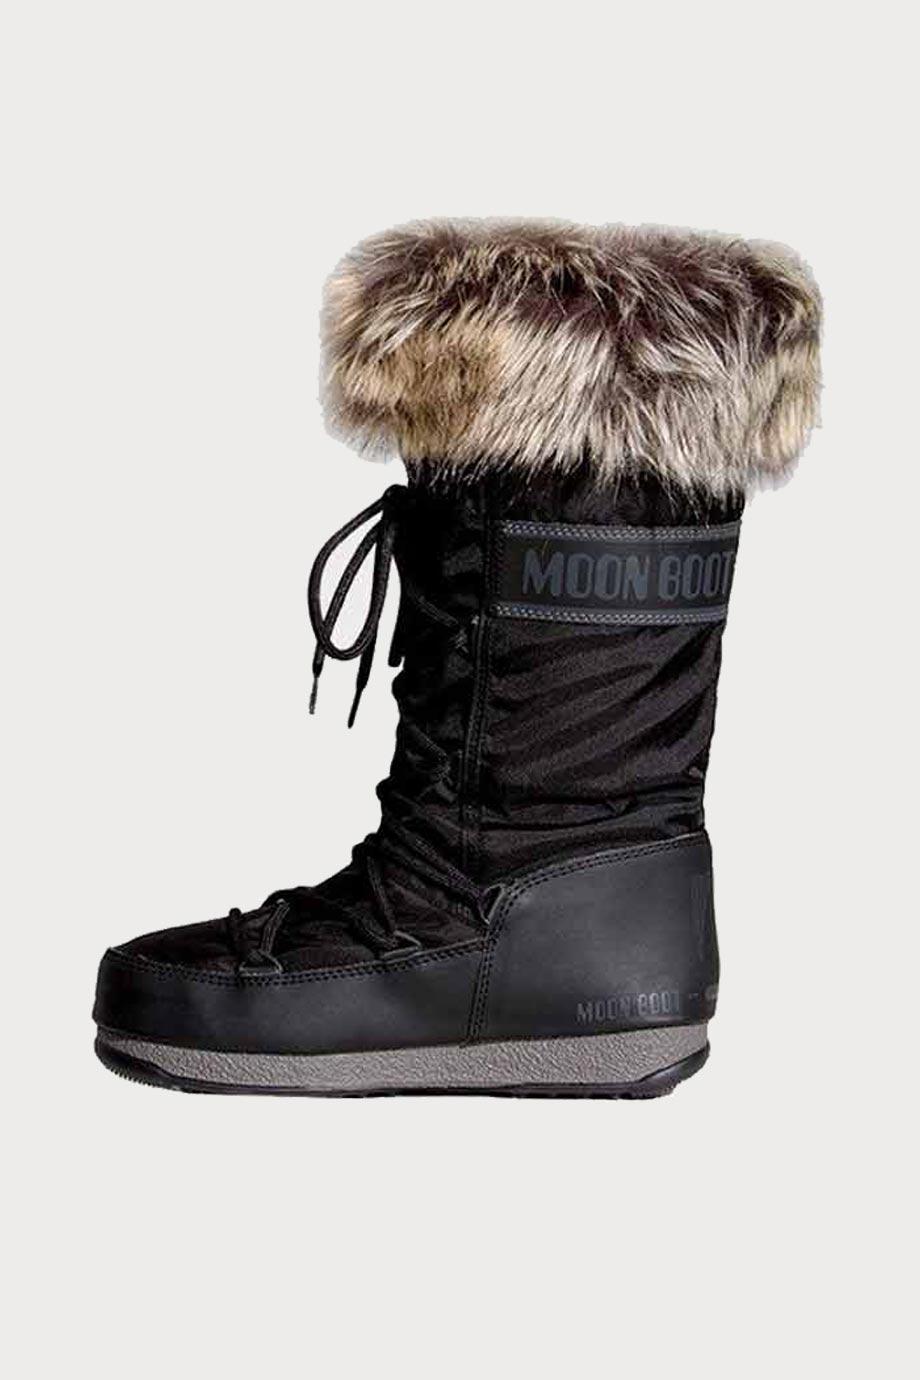 spiridoula metheniti shoes xalkida p 24008700 001 black high fur MoonBoot 2